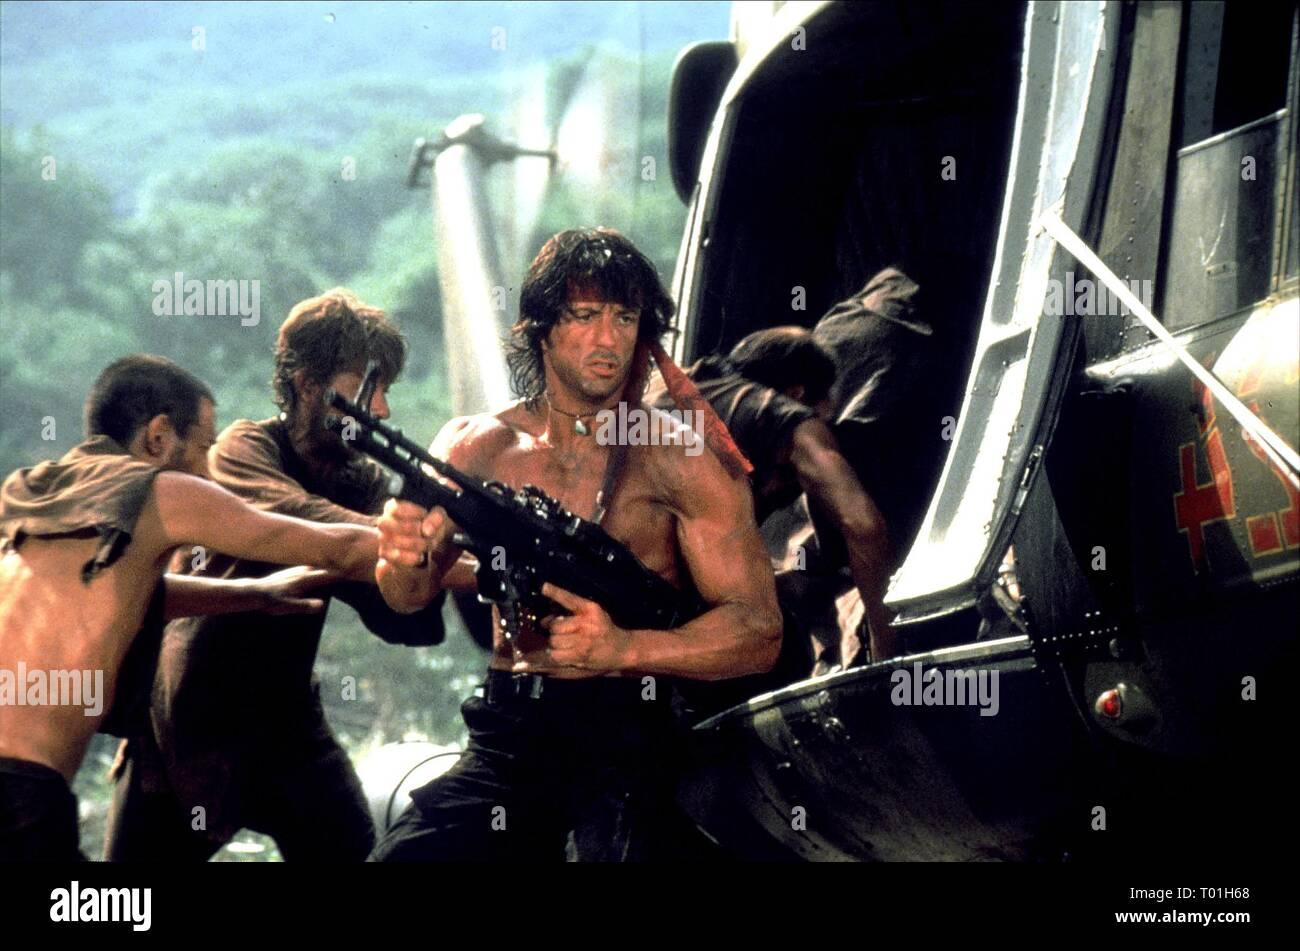 John Rambo Movie Stock Photos & John Rambo Movie Stock